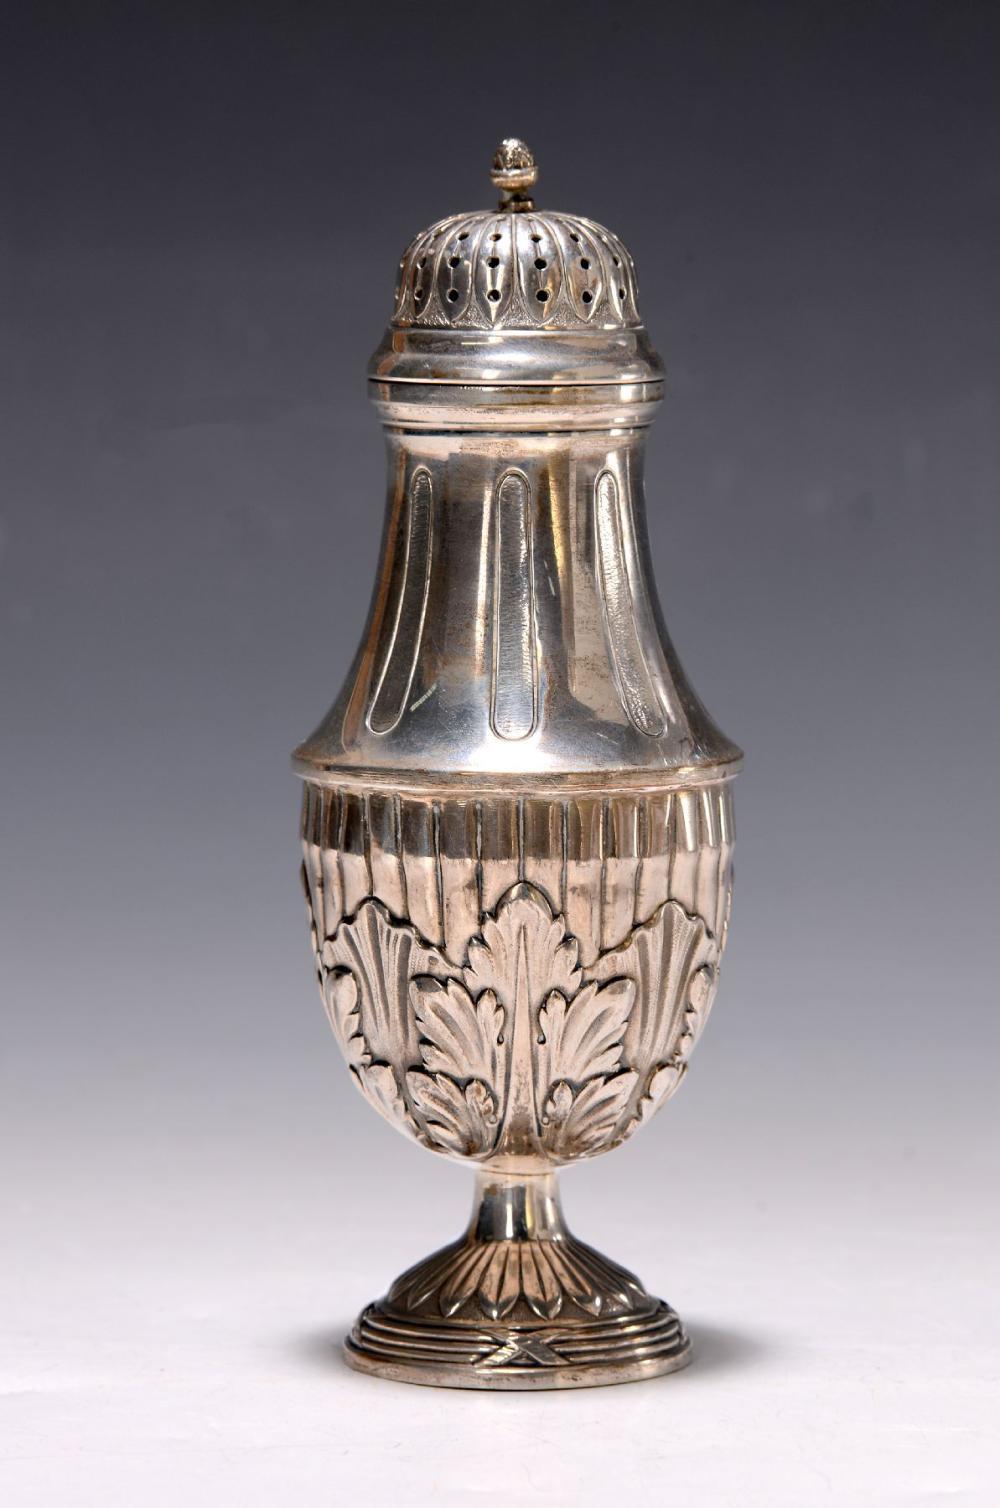 Salt shaker, around 1900, Berlin, classicist decor, 800